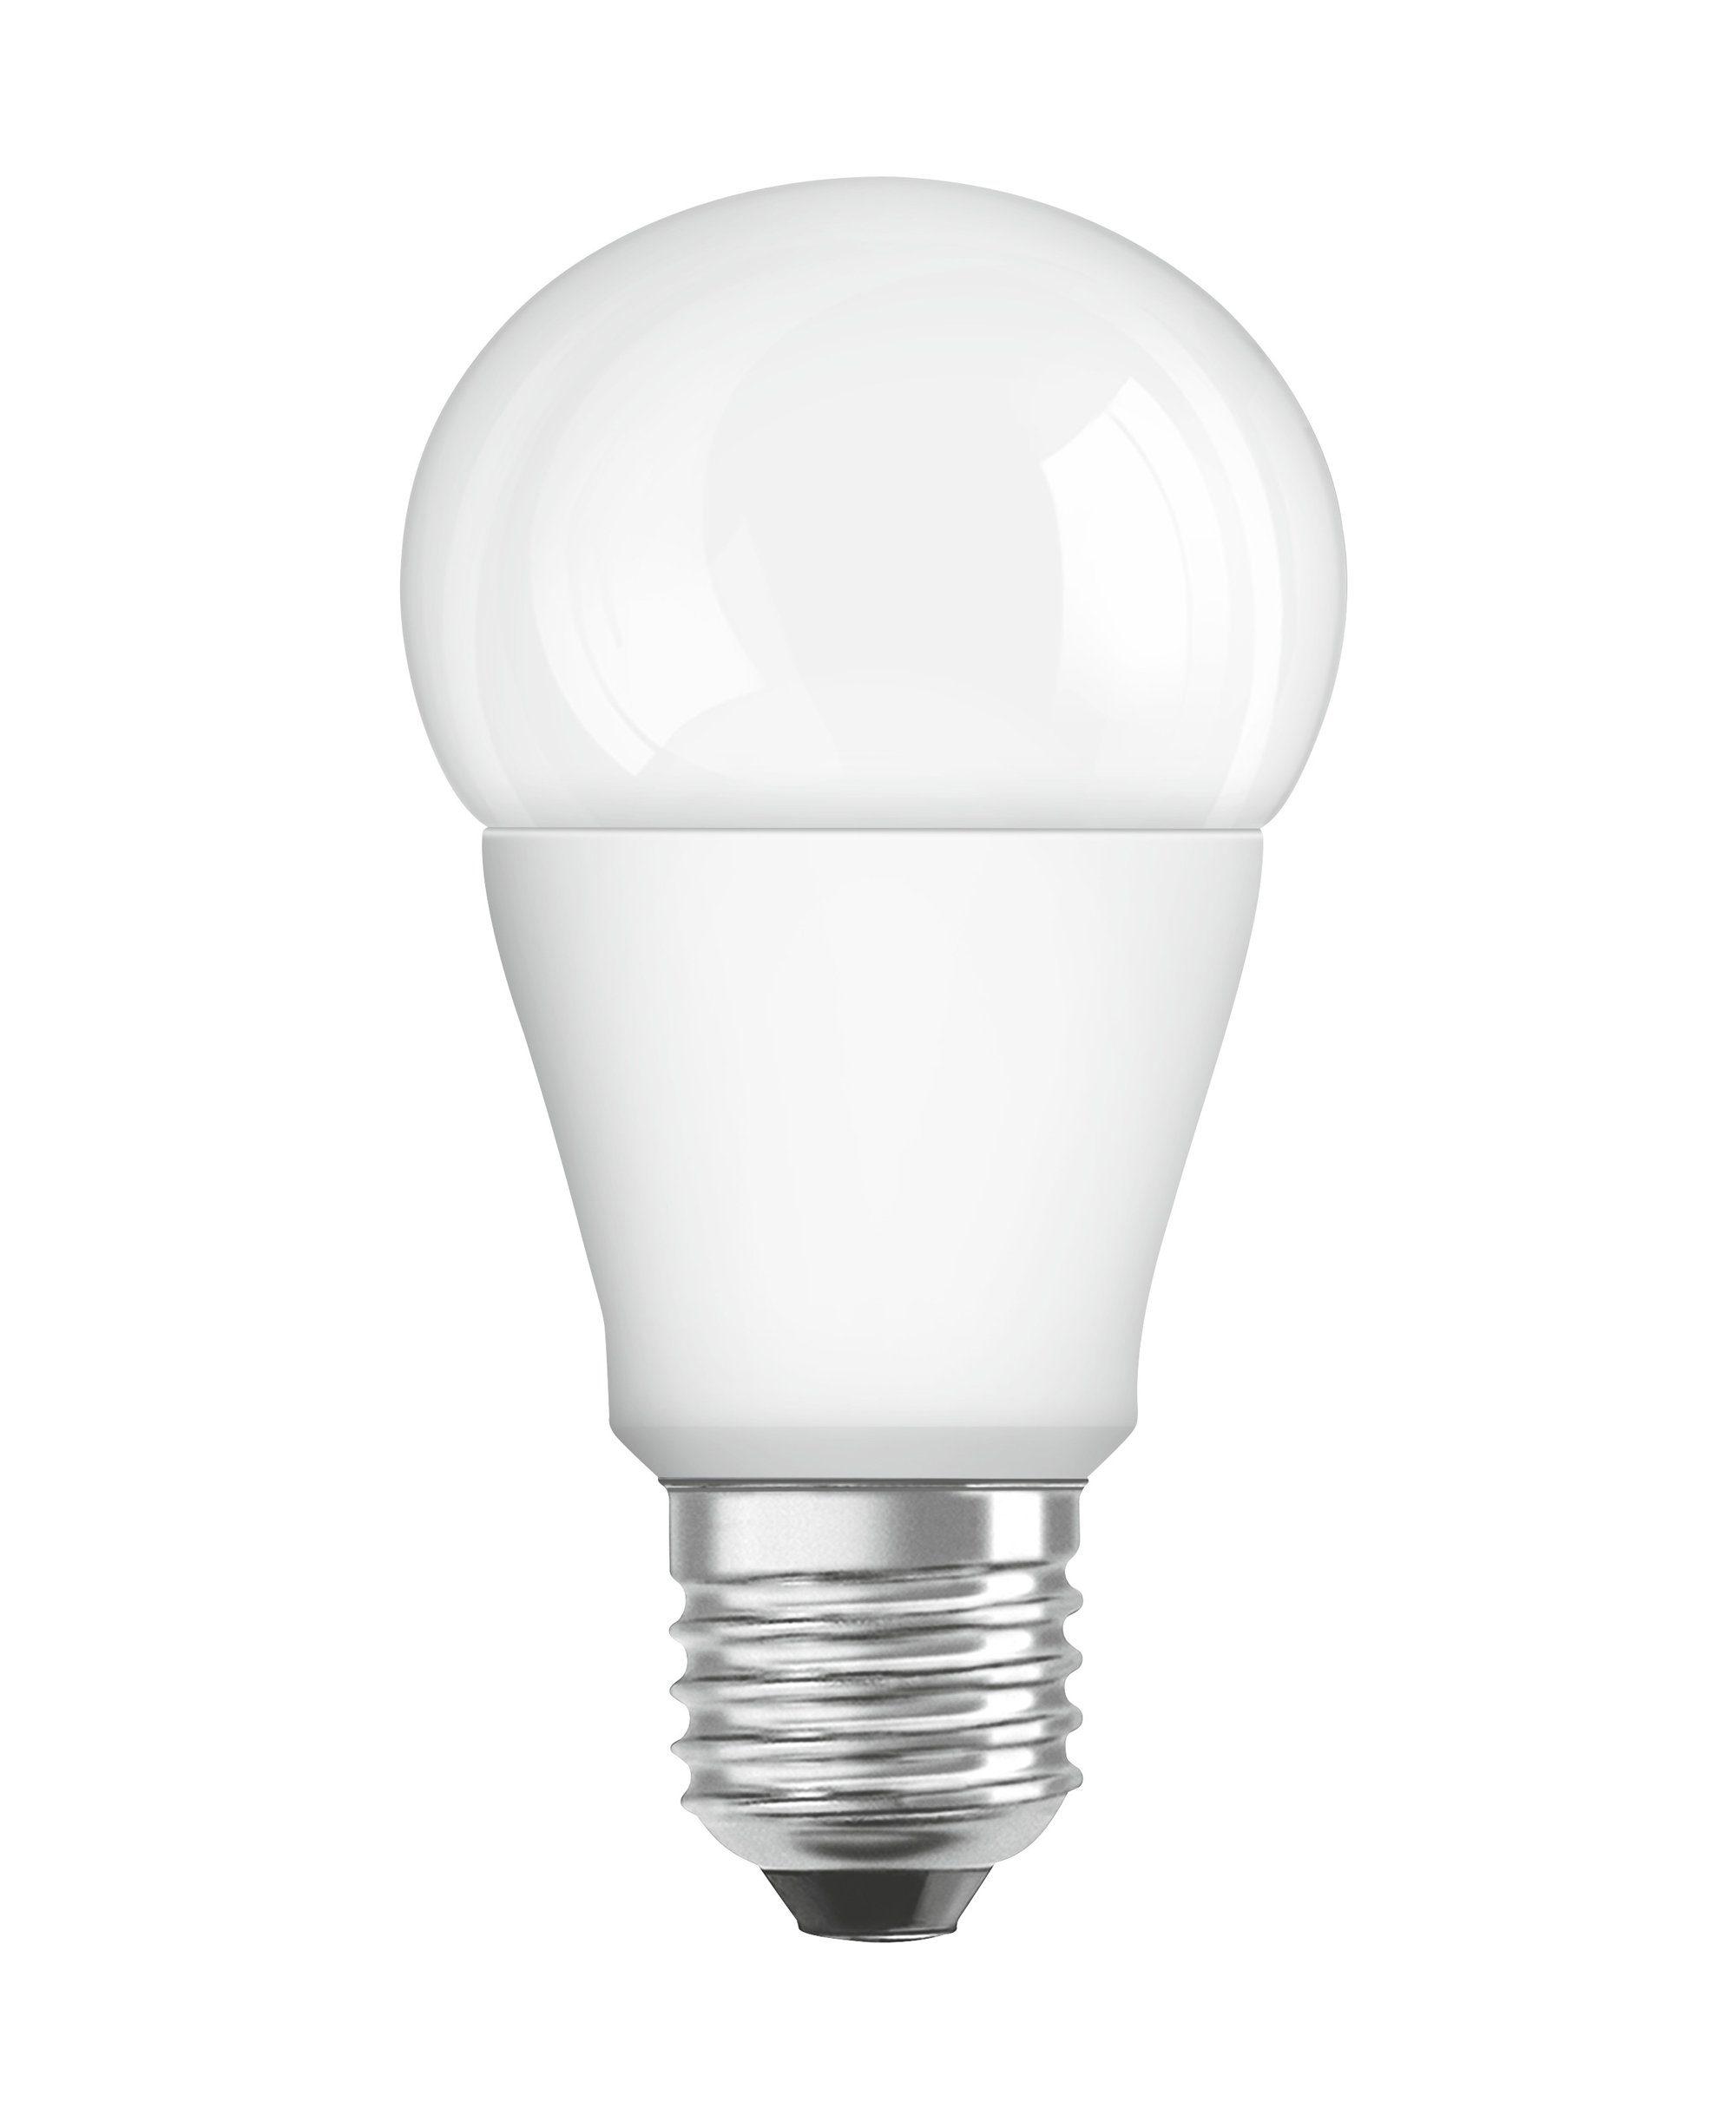 Osram LED STAR CLASSIC, LED-Lampe »ST CLAS A 75 10.5 W/827 E27 FR«